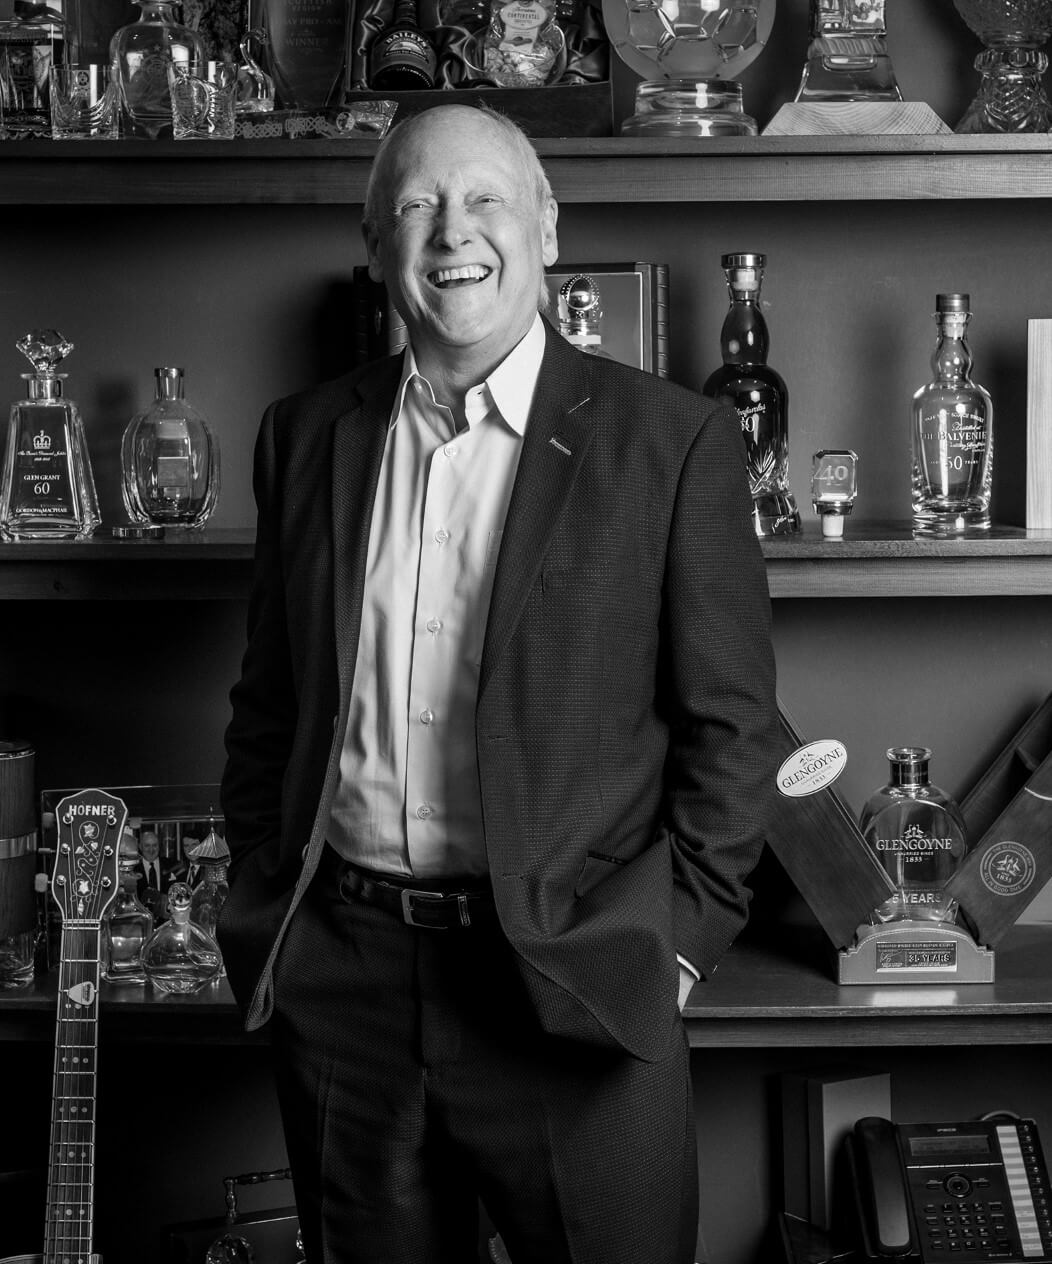 Raymond Davidson, the innovator behind the Glencairn glass